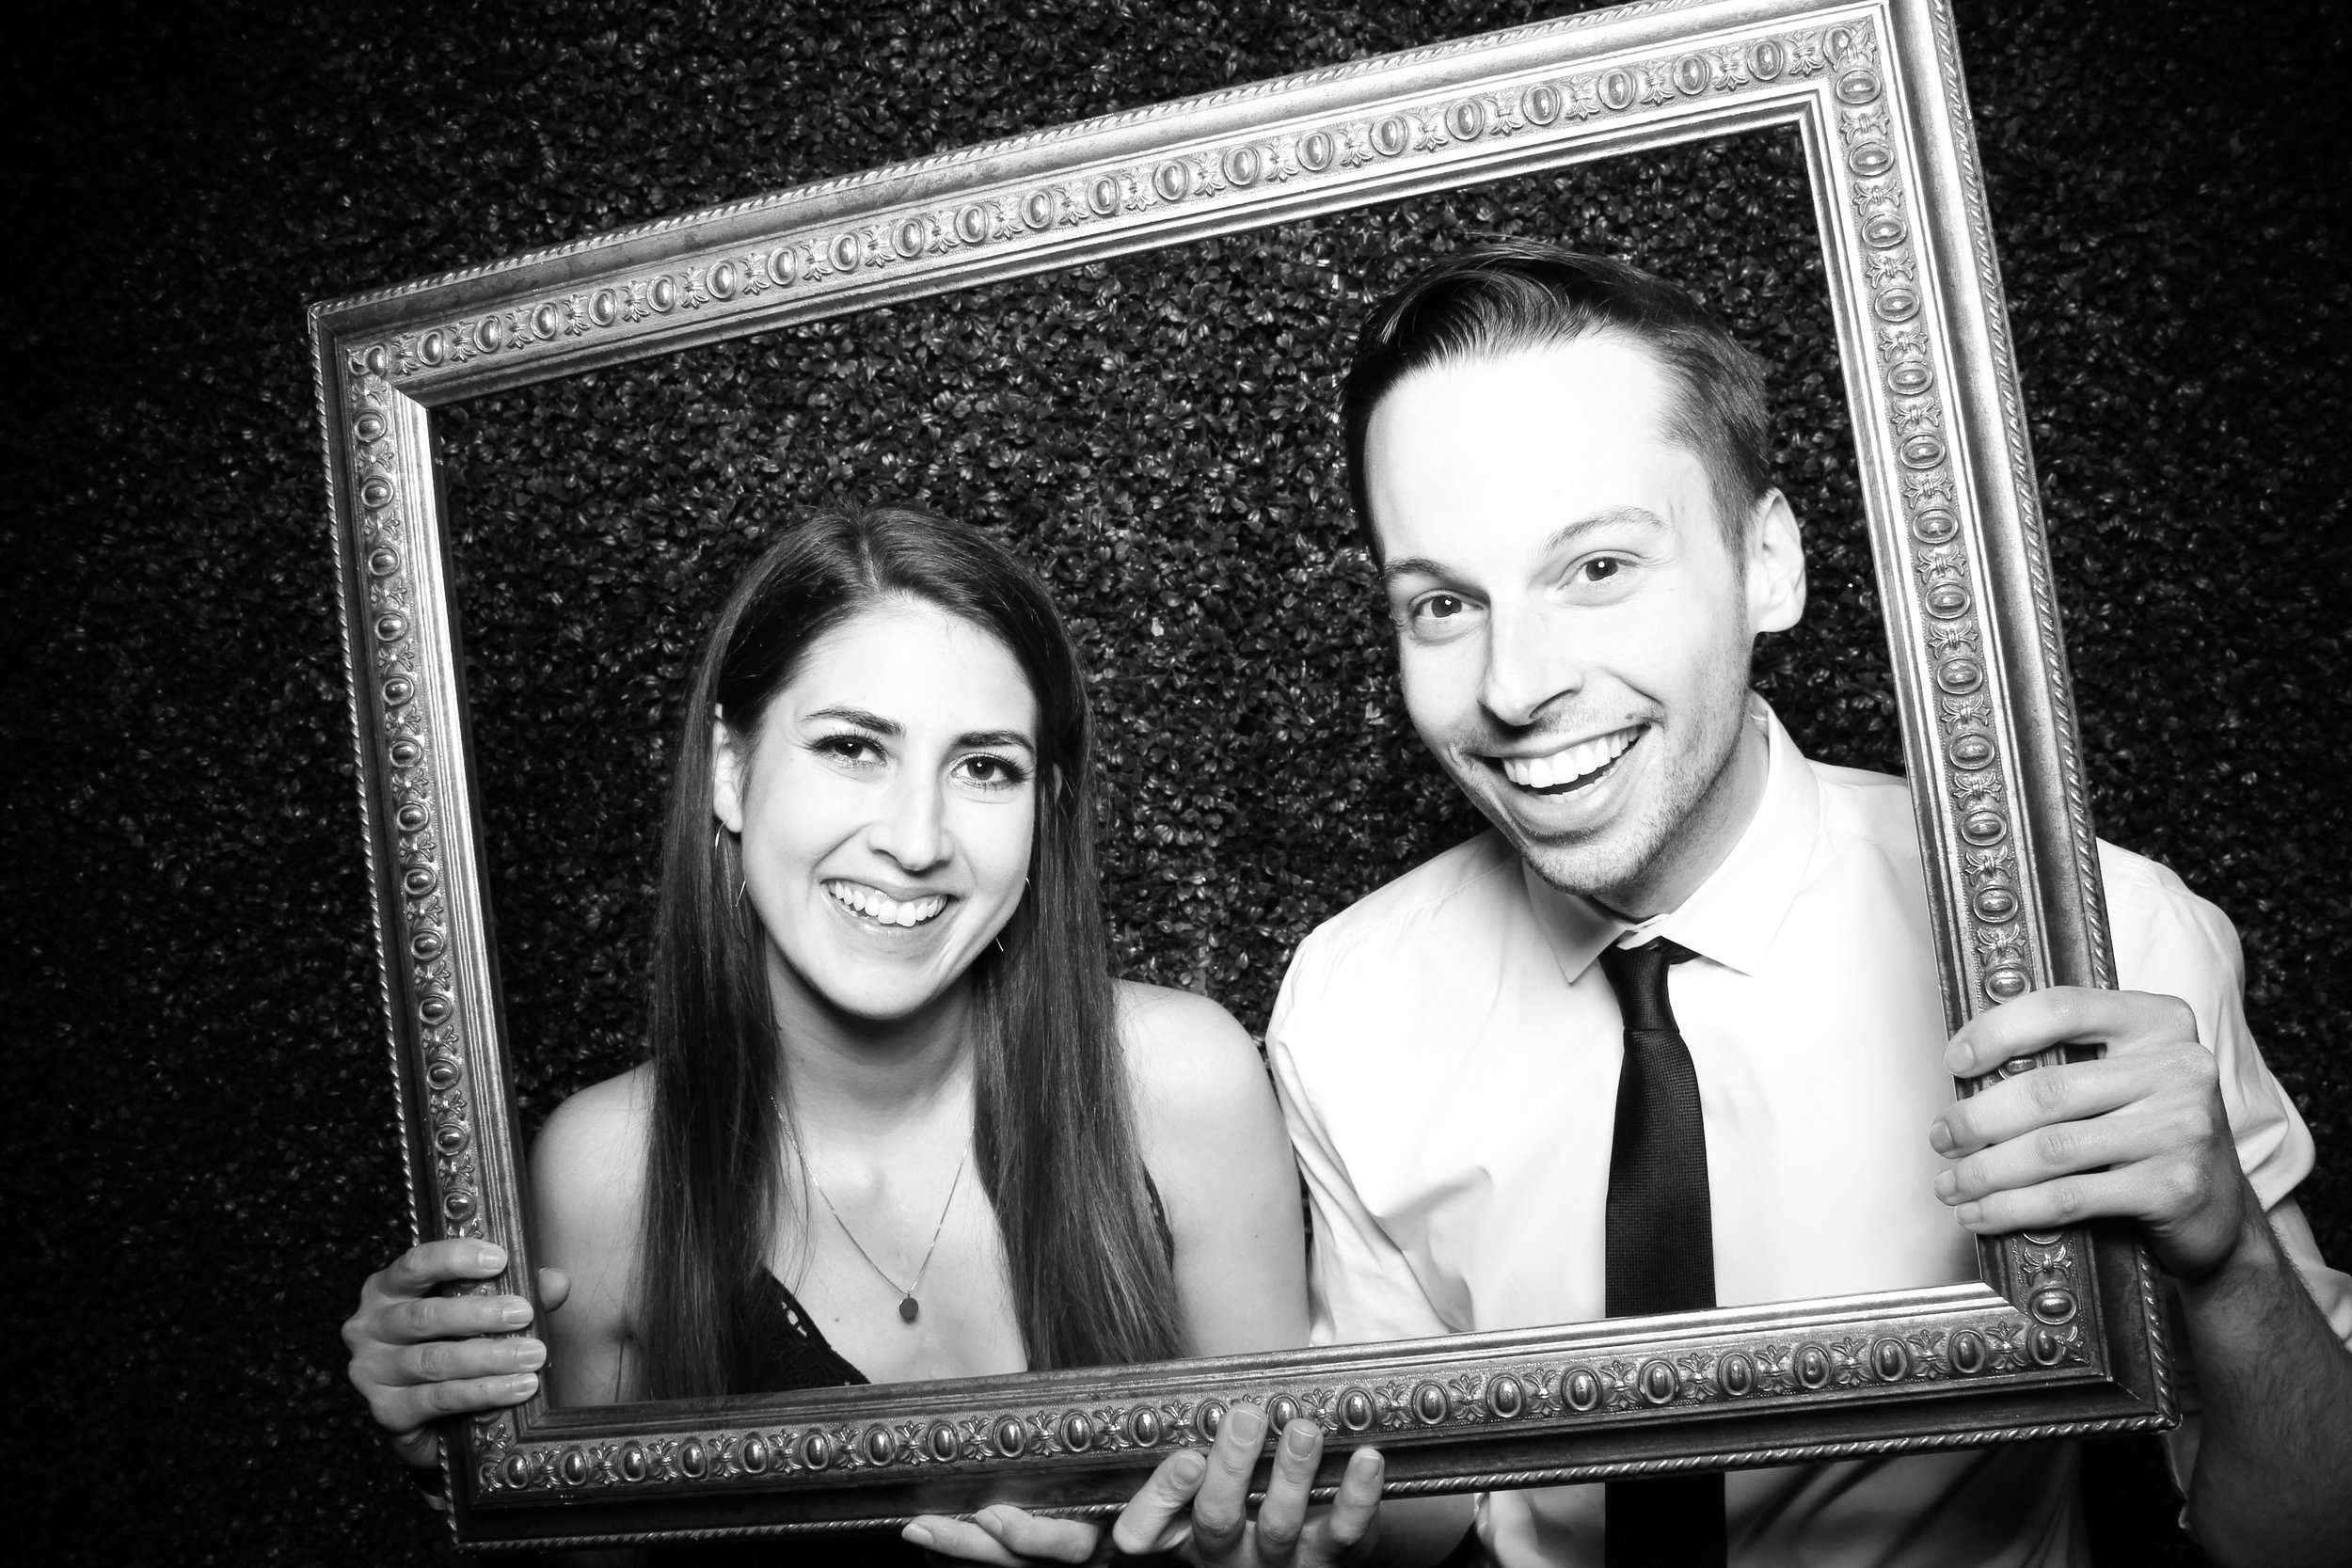 Ivy_Room_Chicago_Wedding_Reception_Photo_Booth_Rental__11.jpg